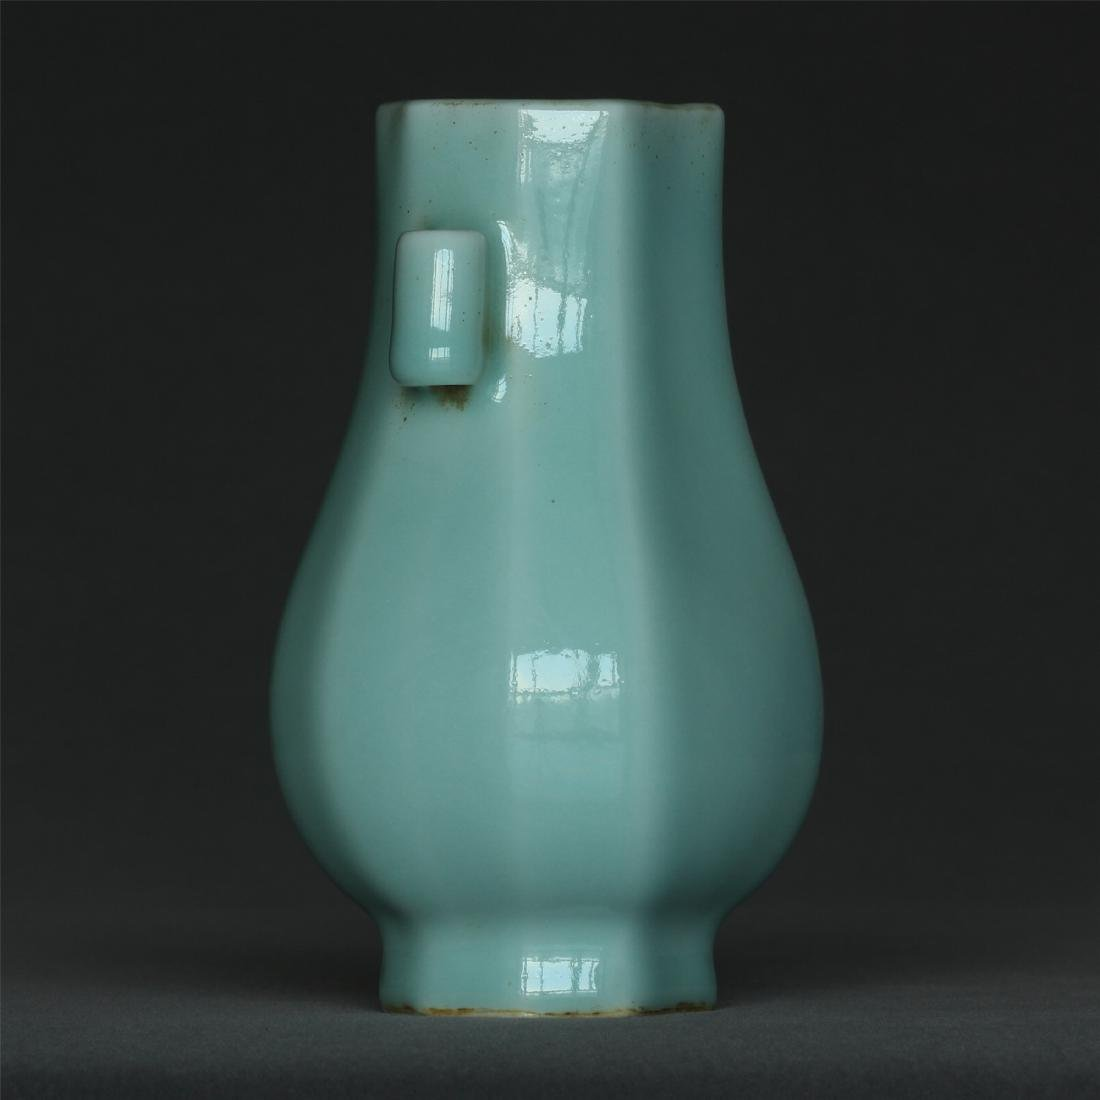 Blue glaze porcelain vase of Qing Dynasty QianLong - 3